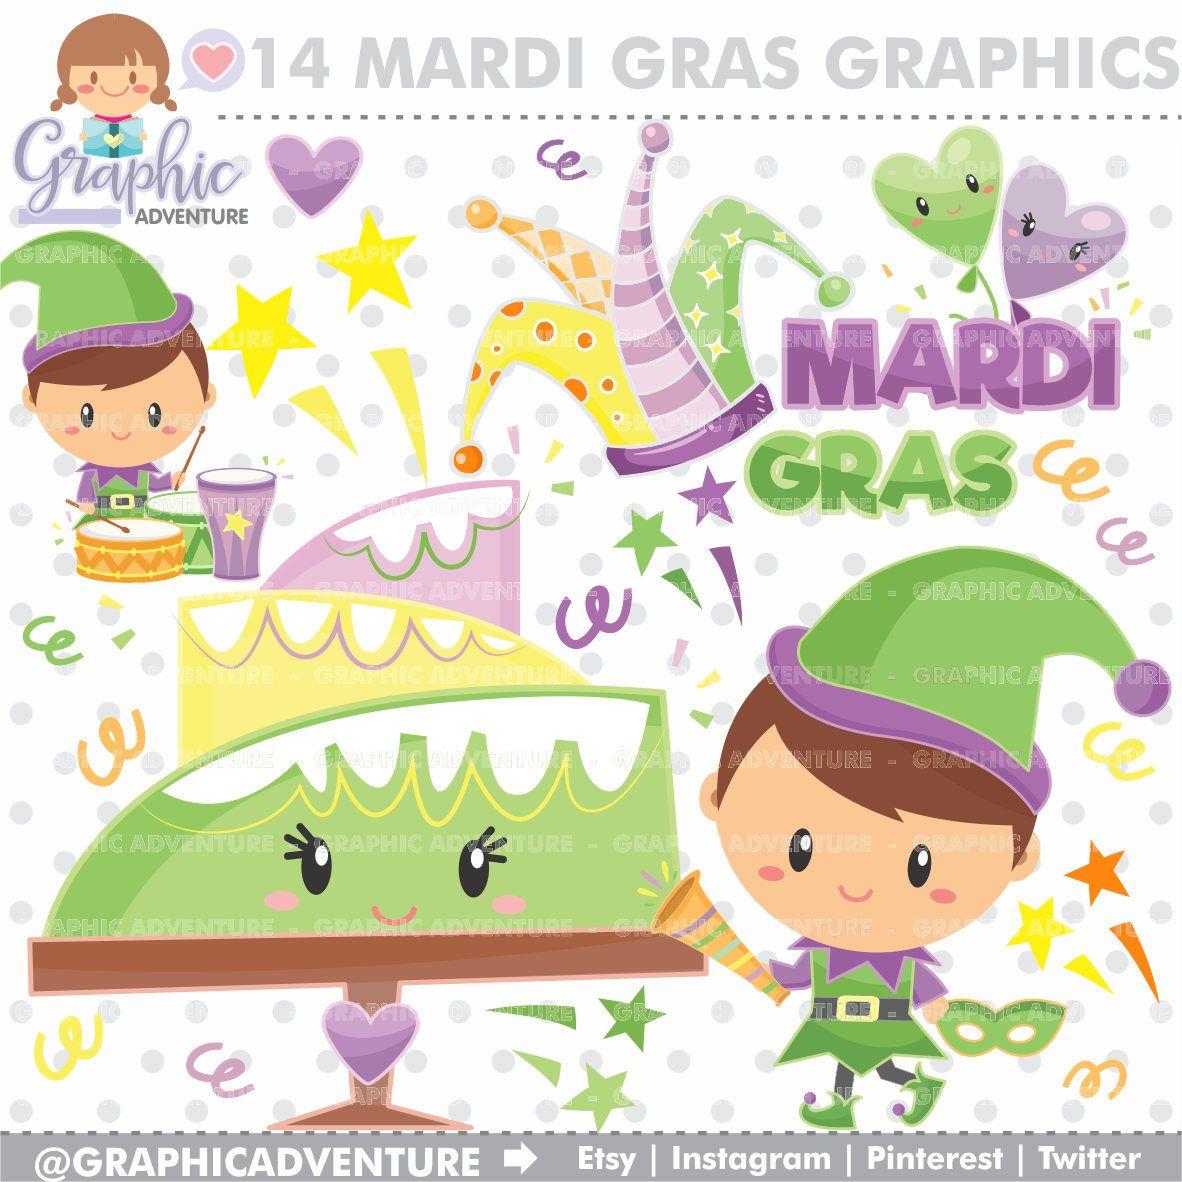 Snoopy mardi gras clipart clip art freeuse stock Mardi Gras Clipart, Mardi Gras Graphics, COMMERCIAL USE ... clip art freeuse stock